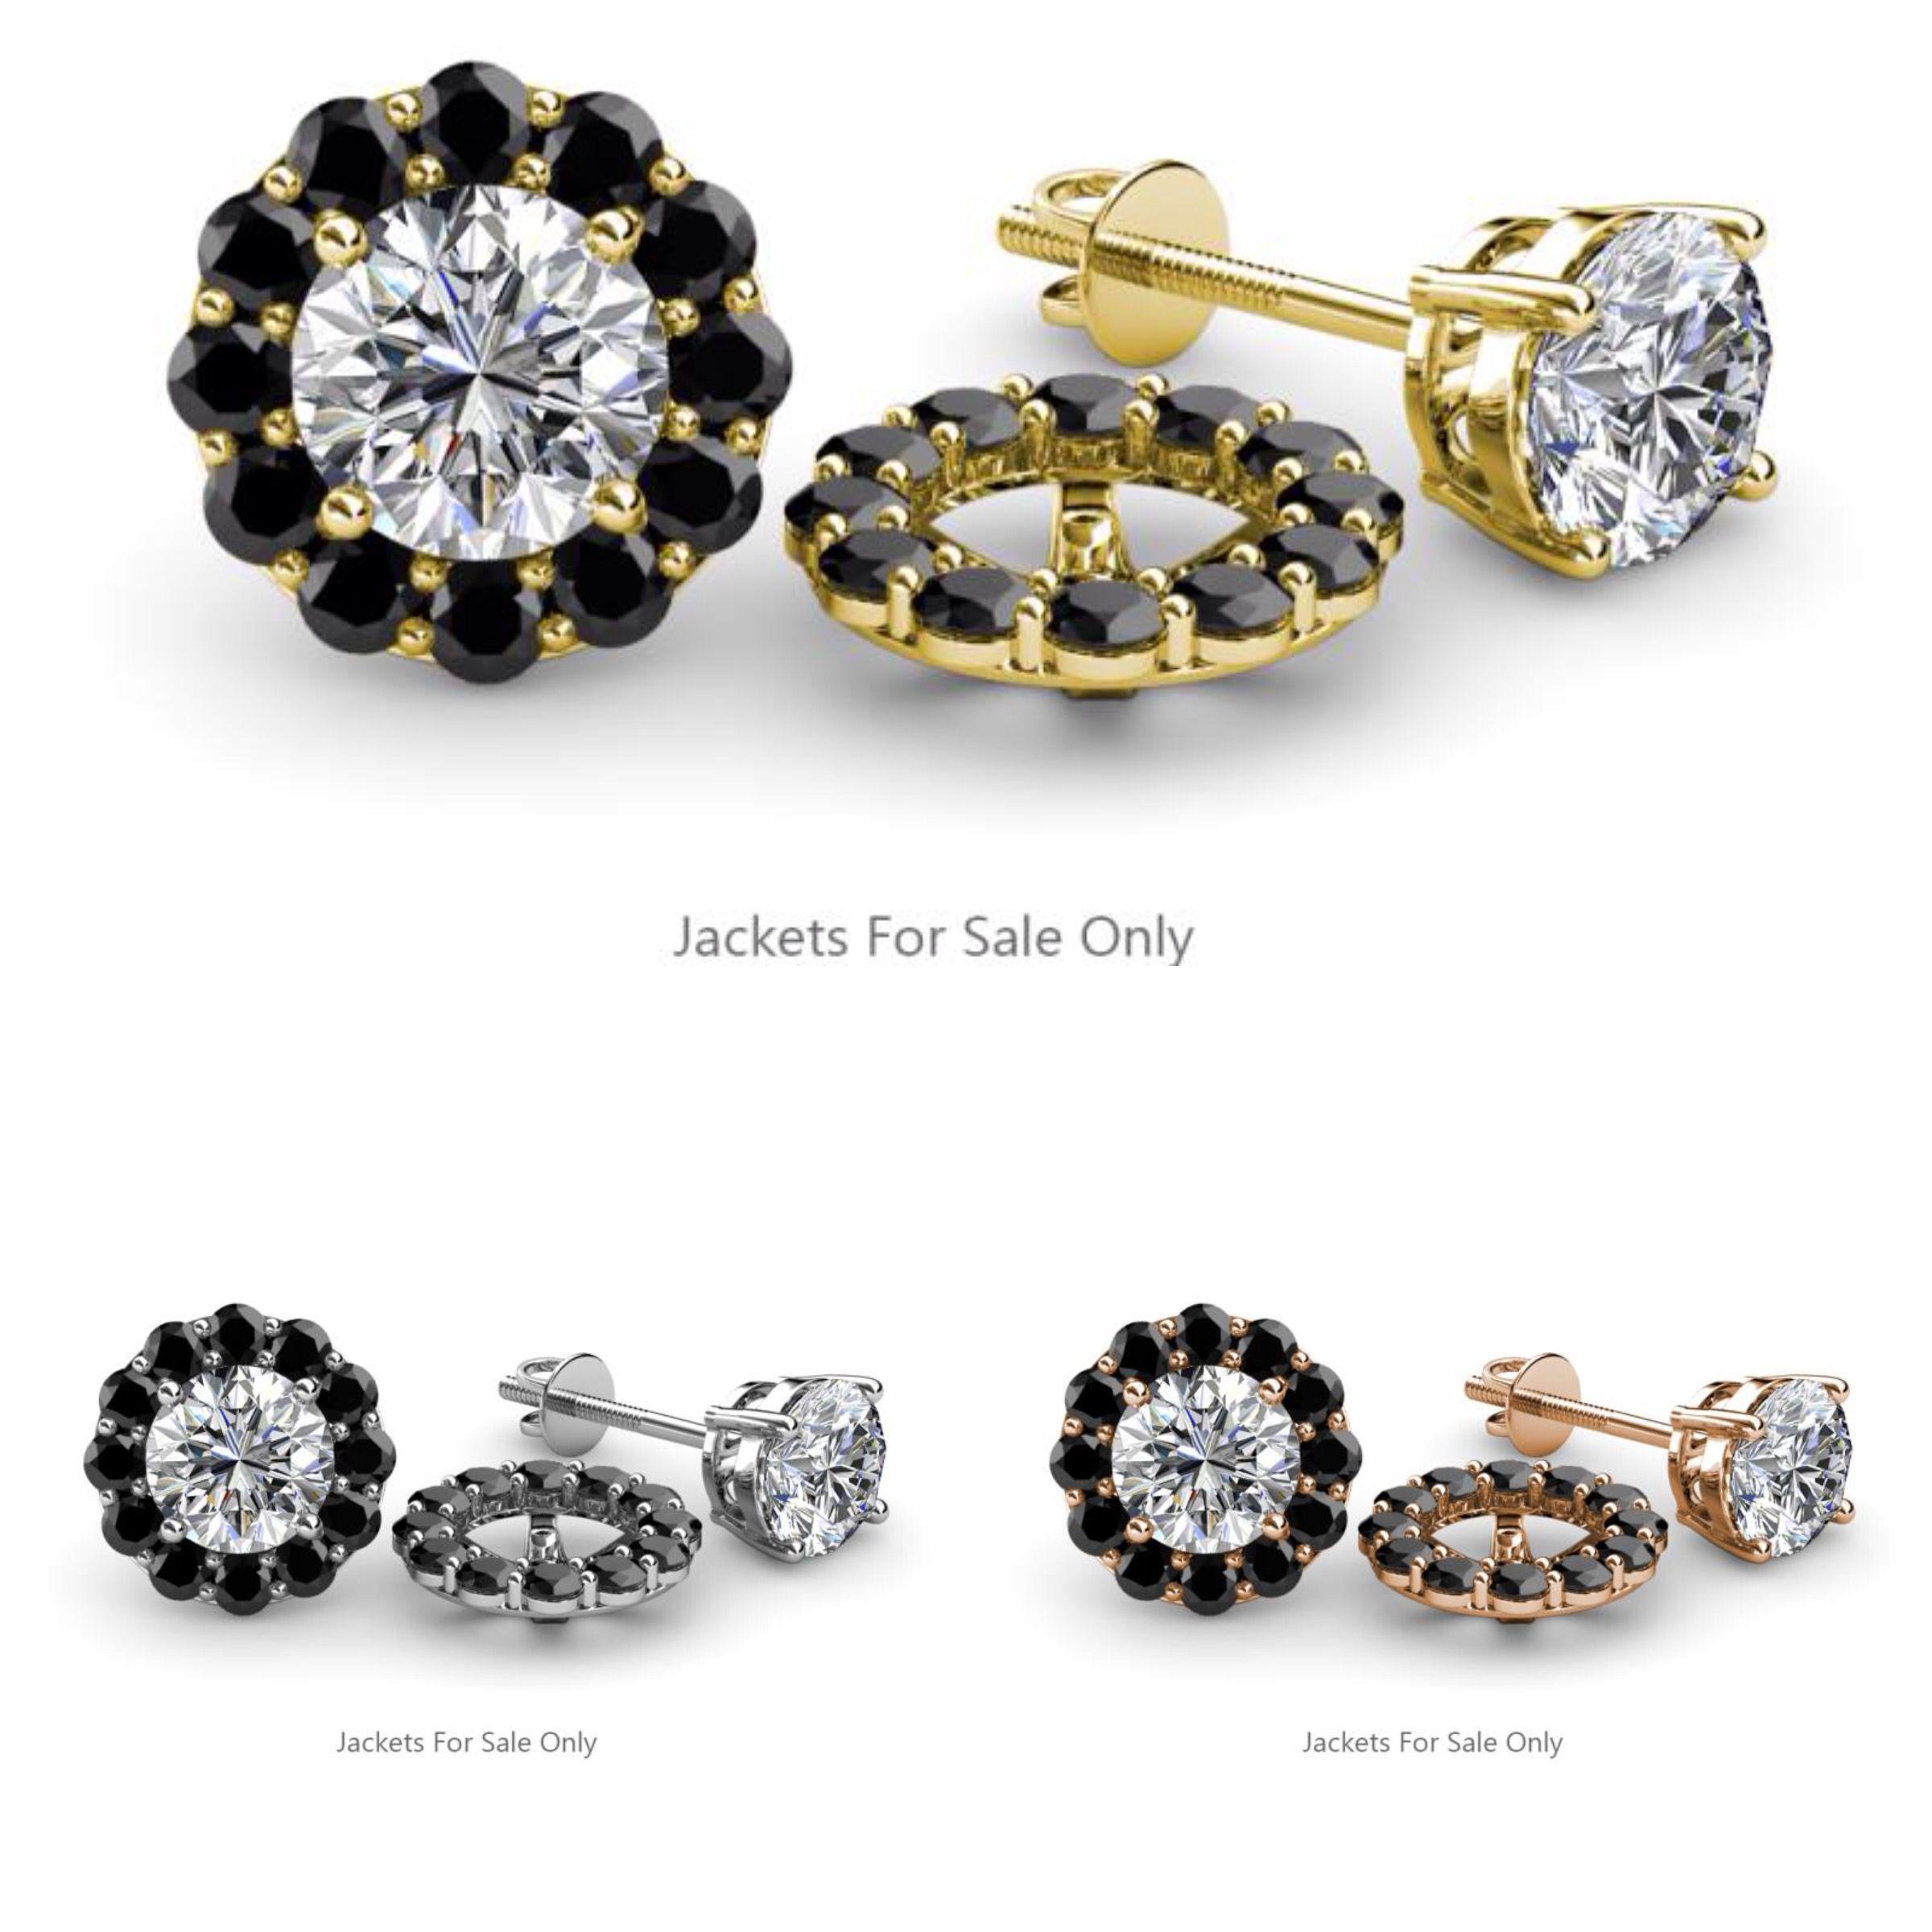 Gold Color Flowers Jacket Stud Earrings In White Yellow Rose 30 Days Return Jacketearrings Earstuds Studs Blackdiamond